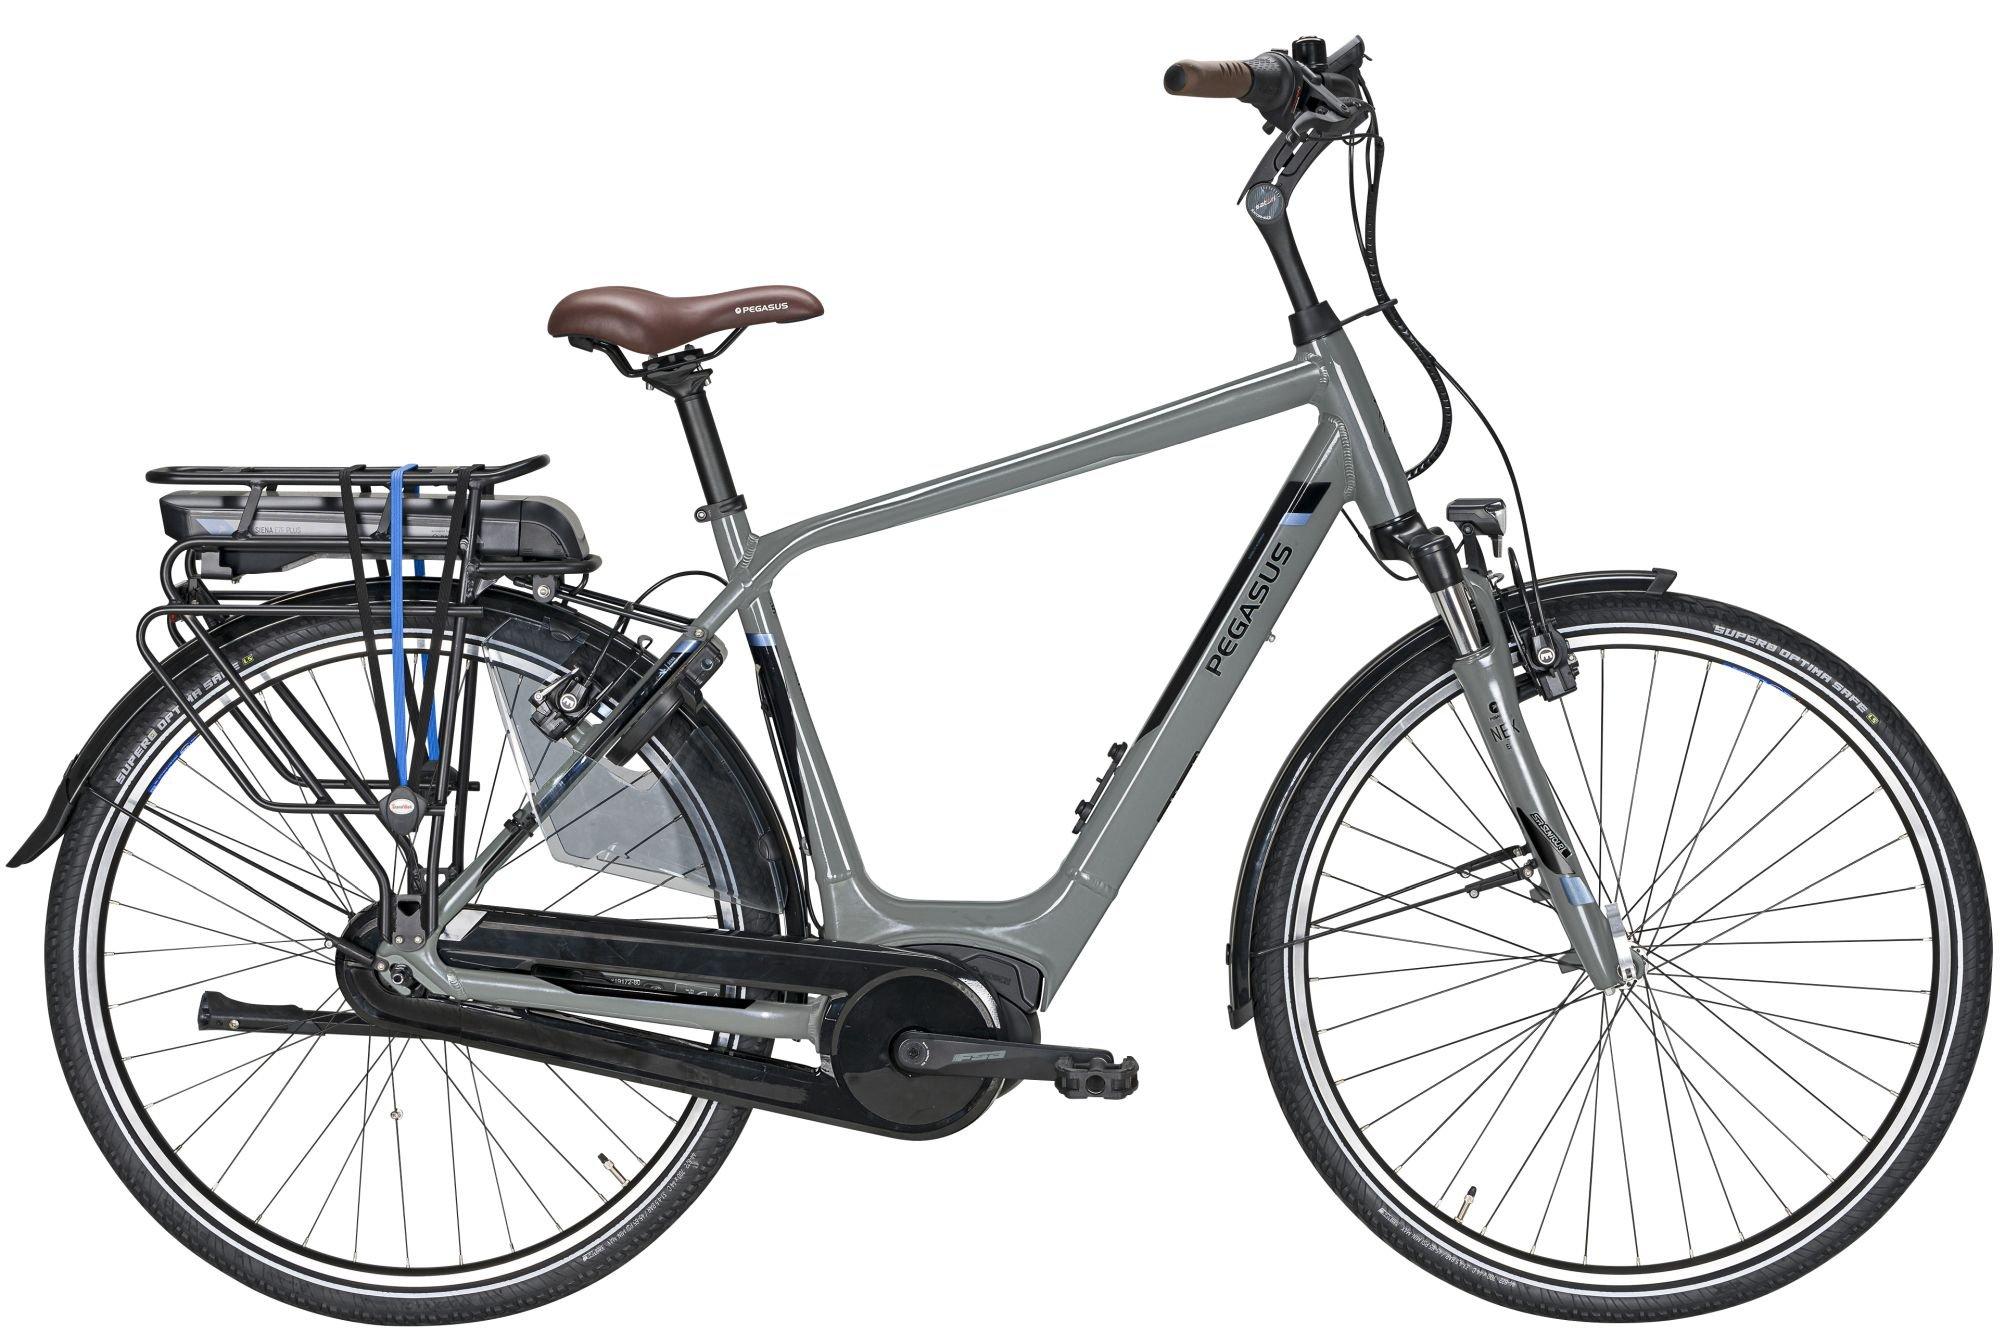 E-Bikes/Citybikes: Pegasus  Siena E8F Plus (500 Wh) 8 Gang Nabenschaltung Herrenfahrrad Trekking Modell 2020 28 Zoll 50 cm